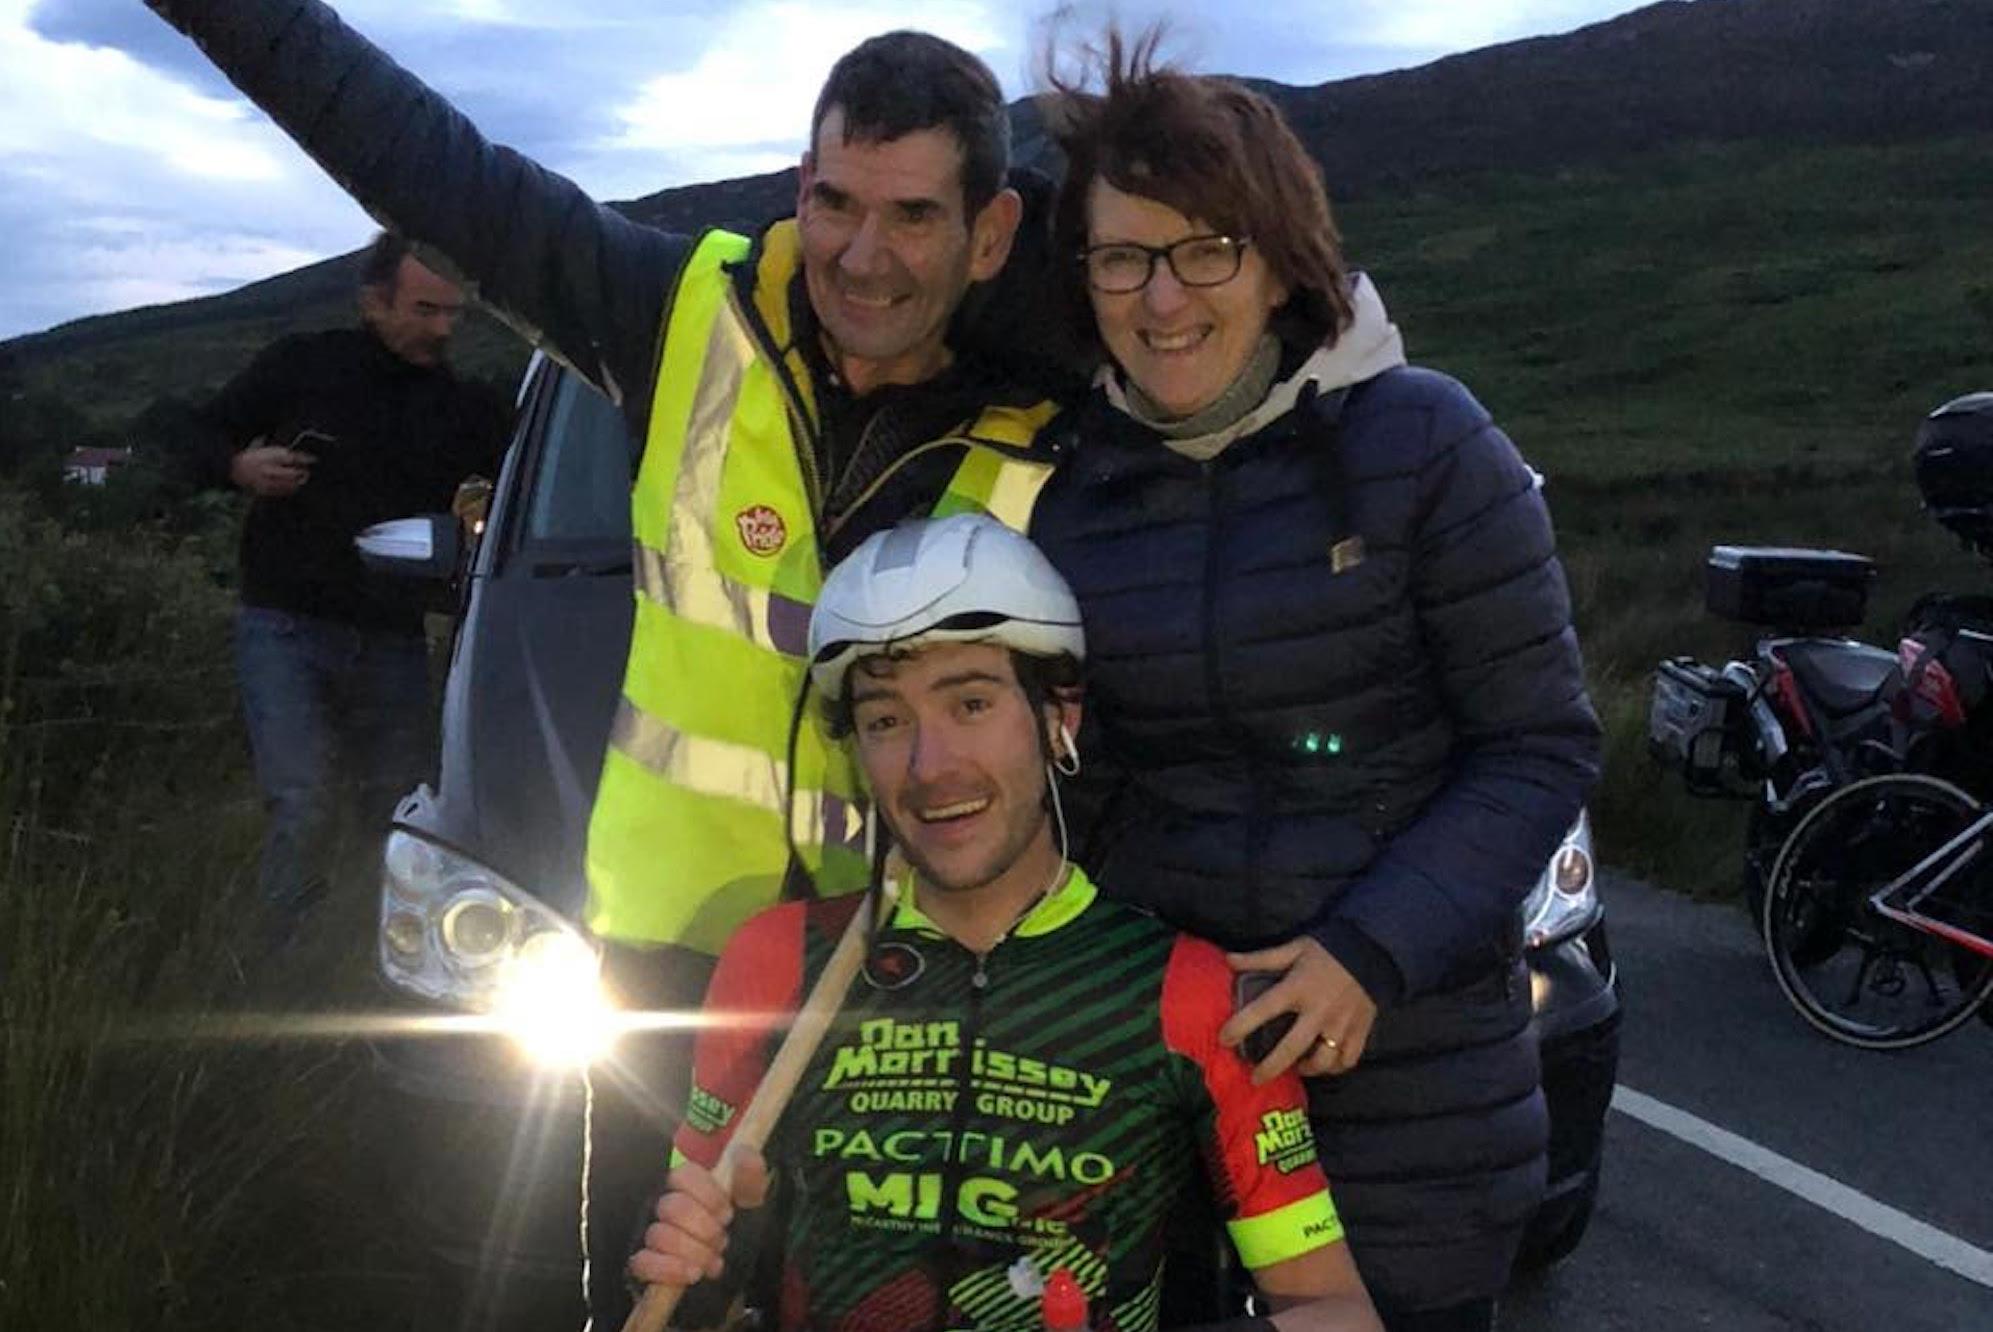 Irish rider destroys Alberto Contador's Everesting record by 20 minutes - Cycling Weekly